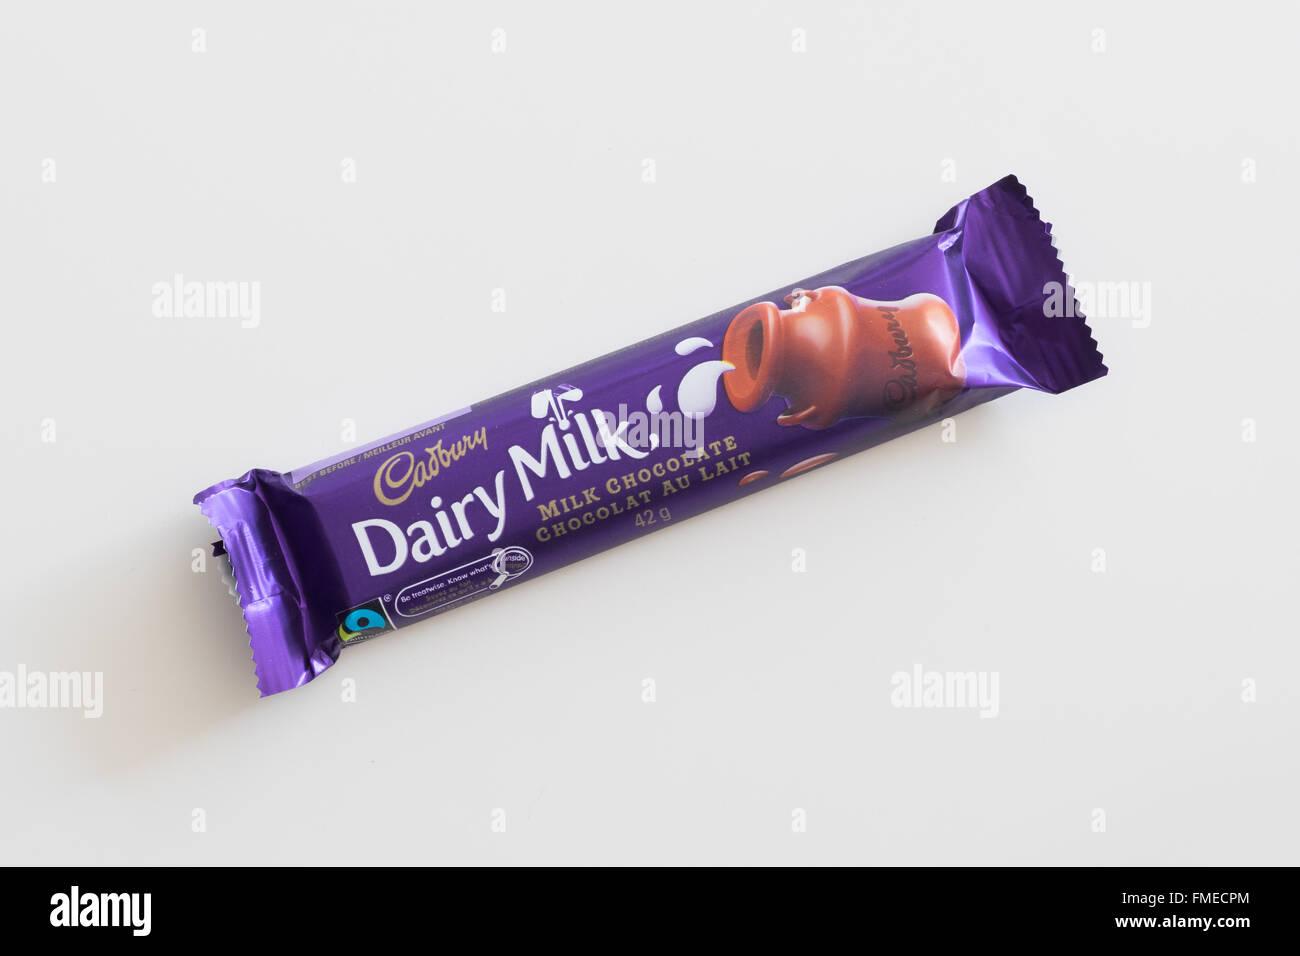 Dairy Milk Chocolate Bar Stock Photos Dairy Milk Chocolate Bar